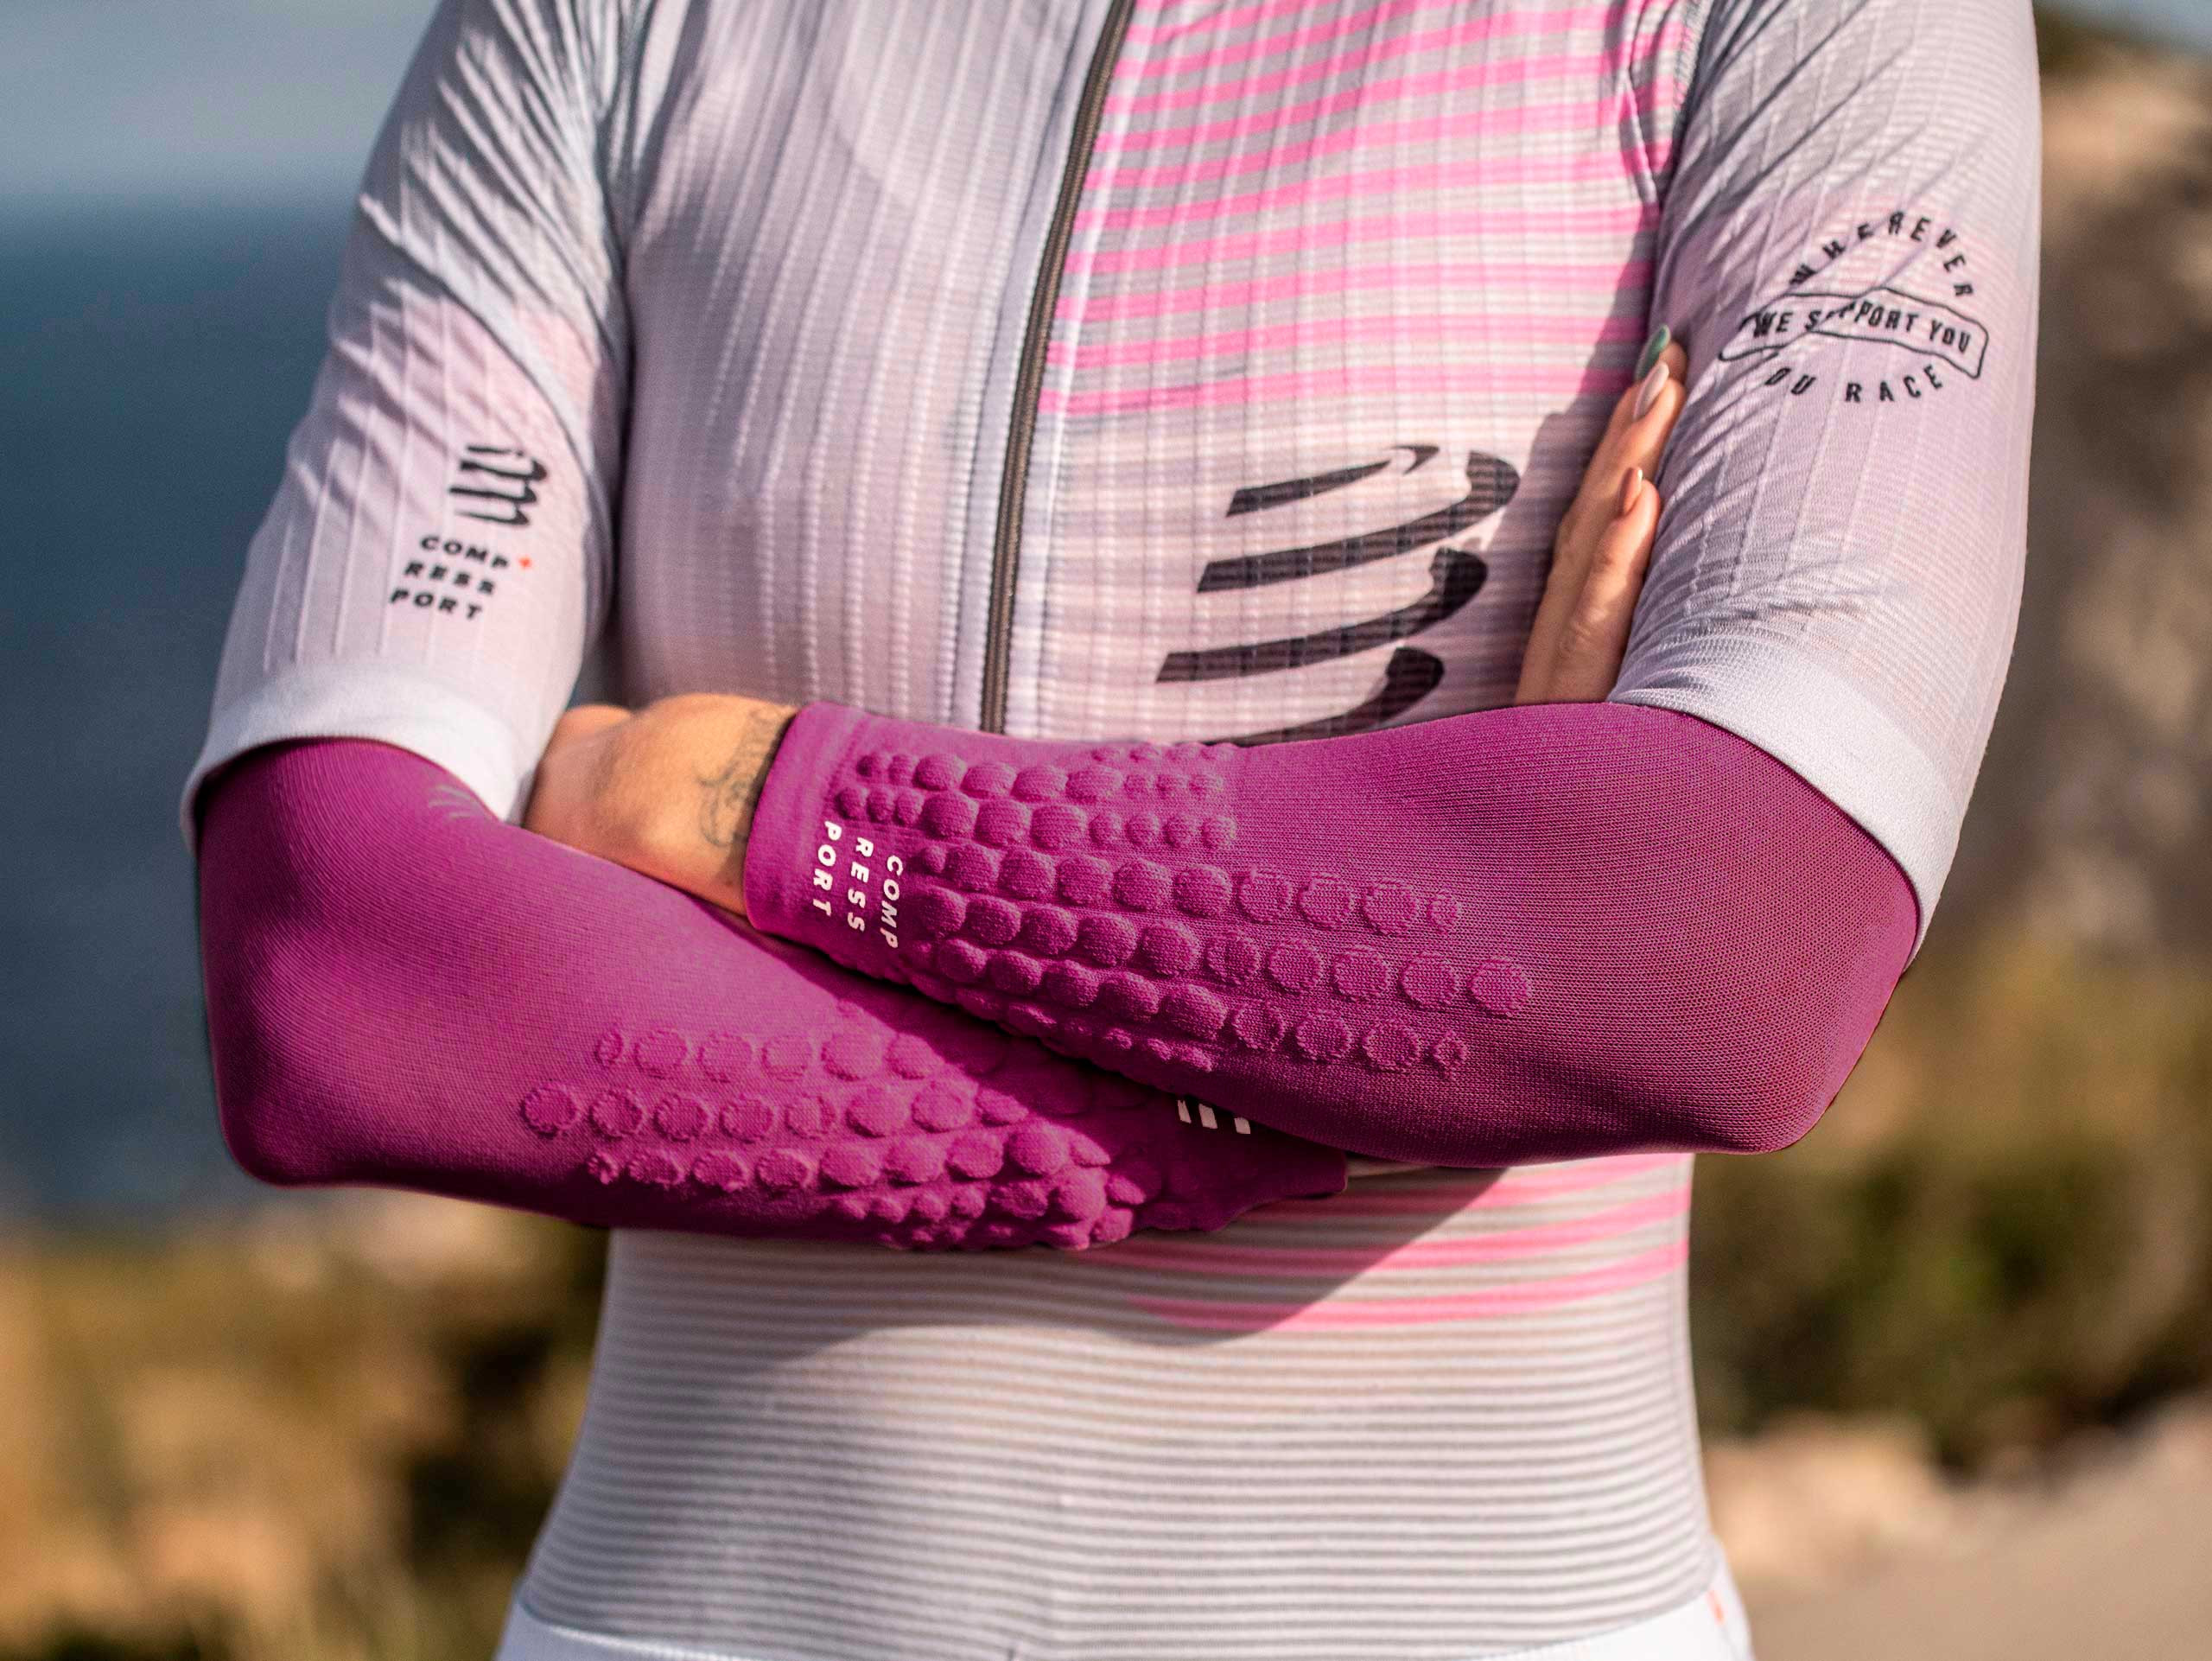 ArmForce ultraleggeri rosa melange